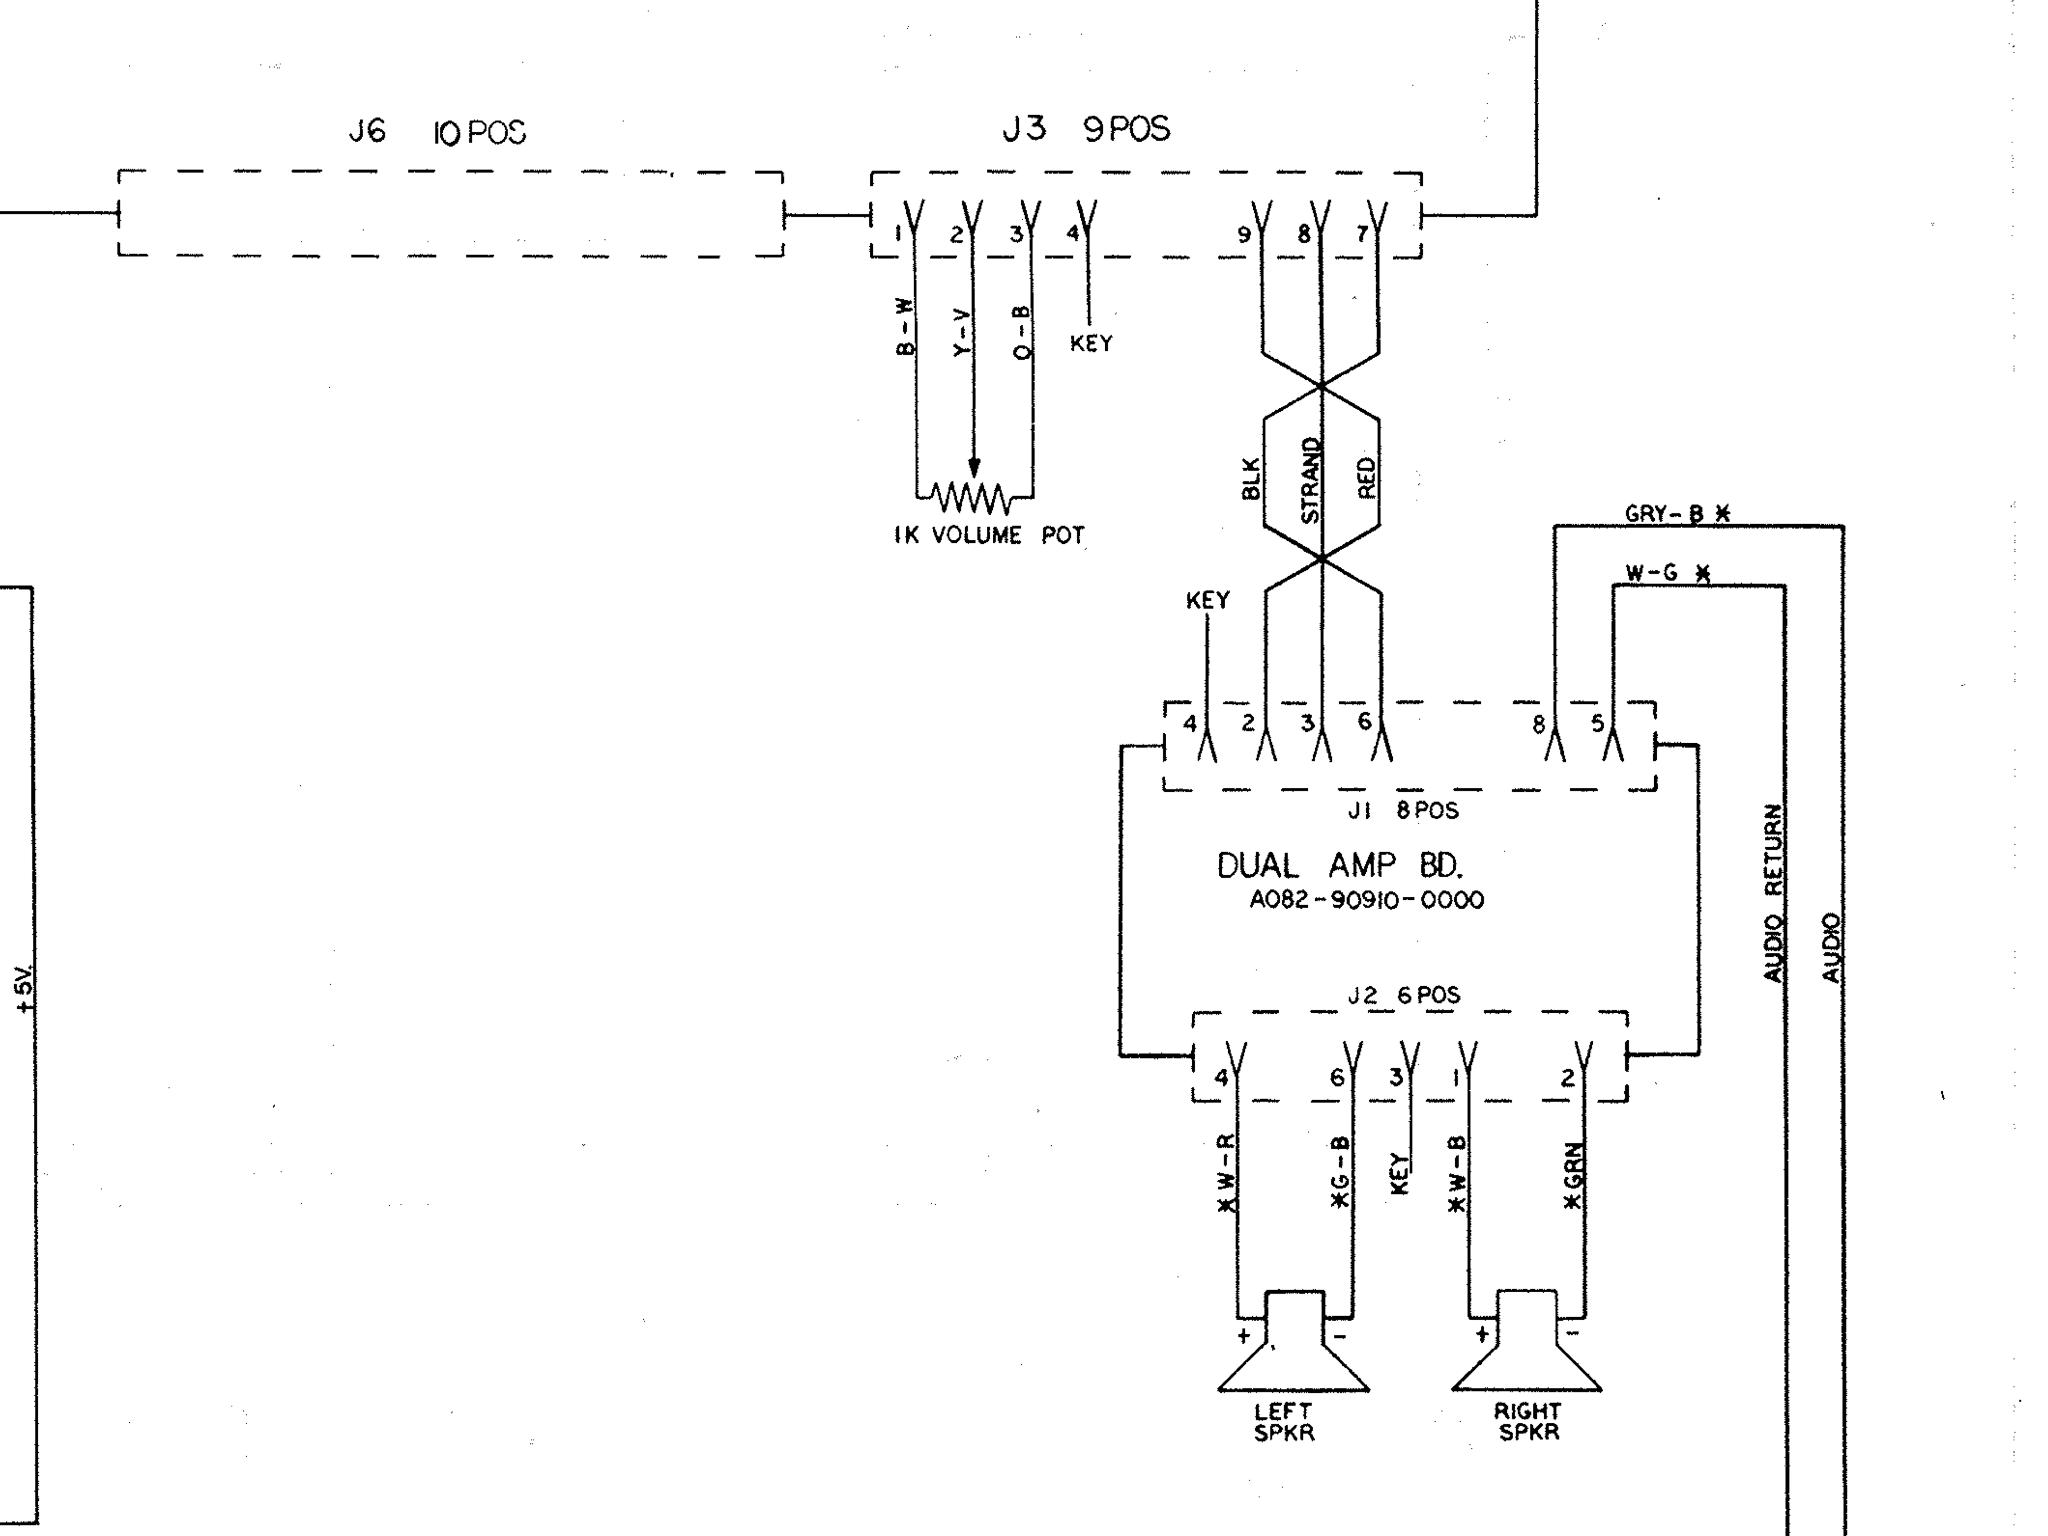 Tron Testing The Audio Amplifier Arcade Game Wiring Diagram 2014 08 10 155335